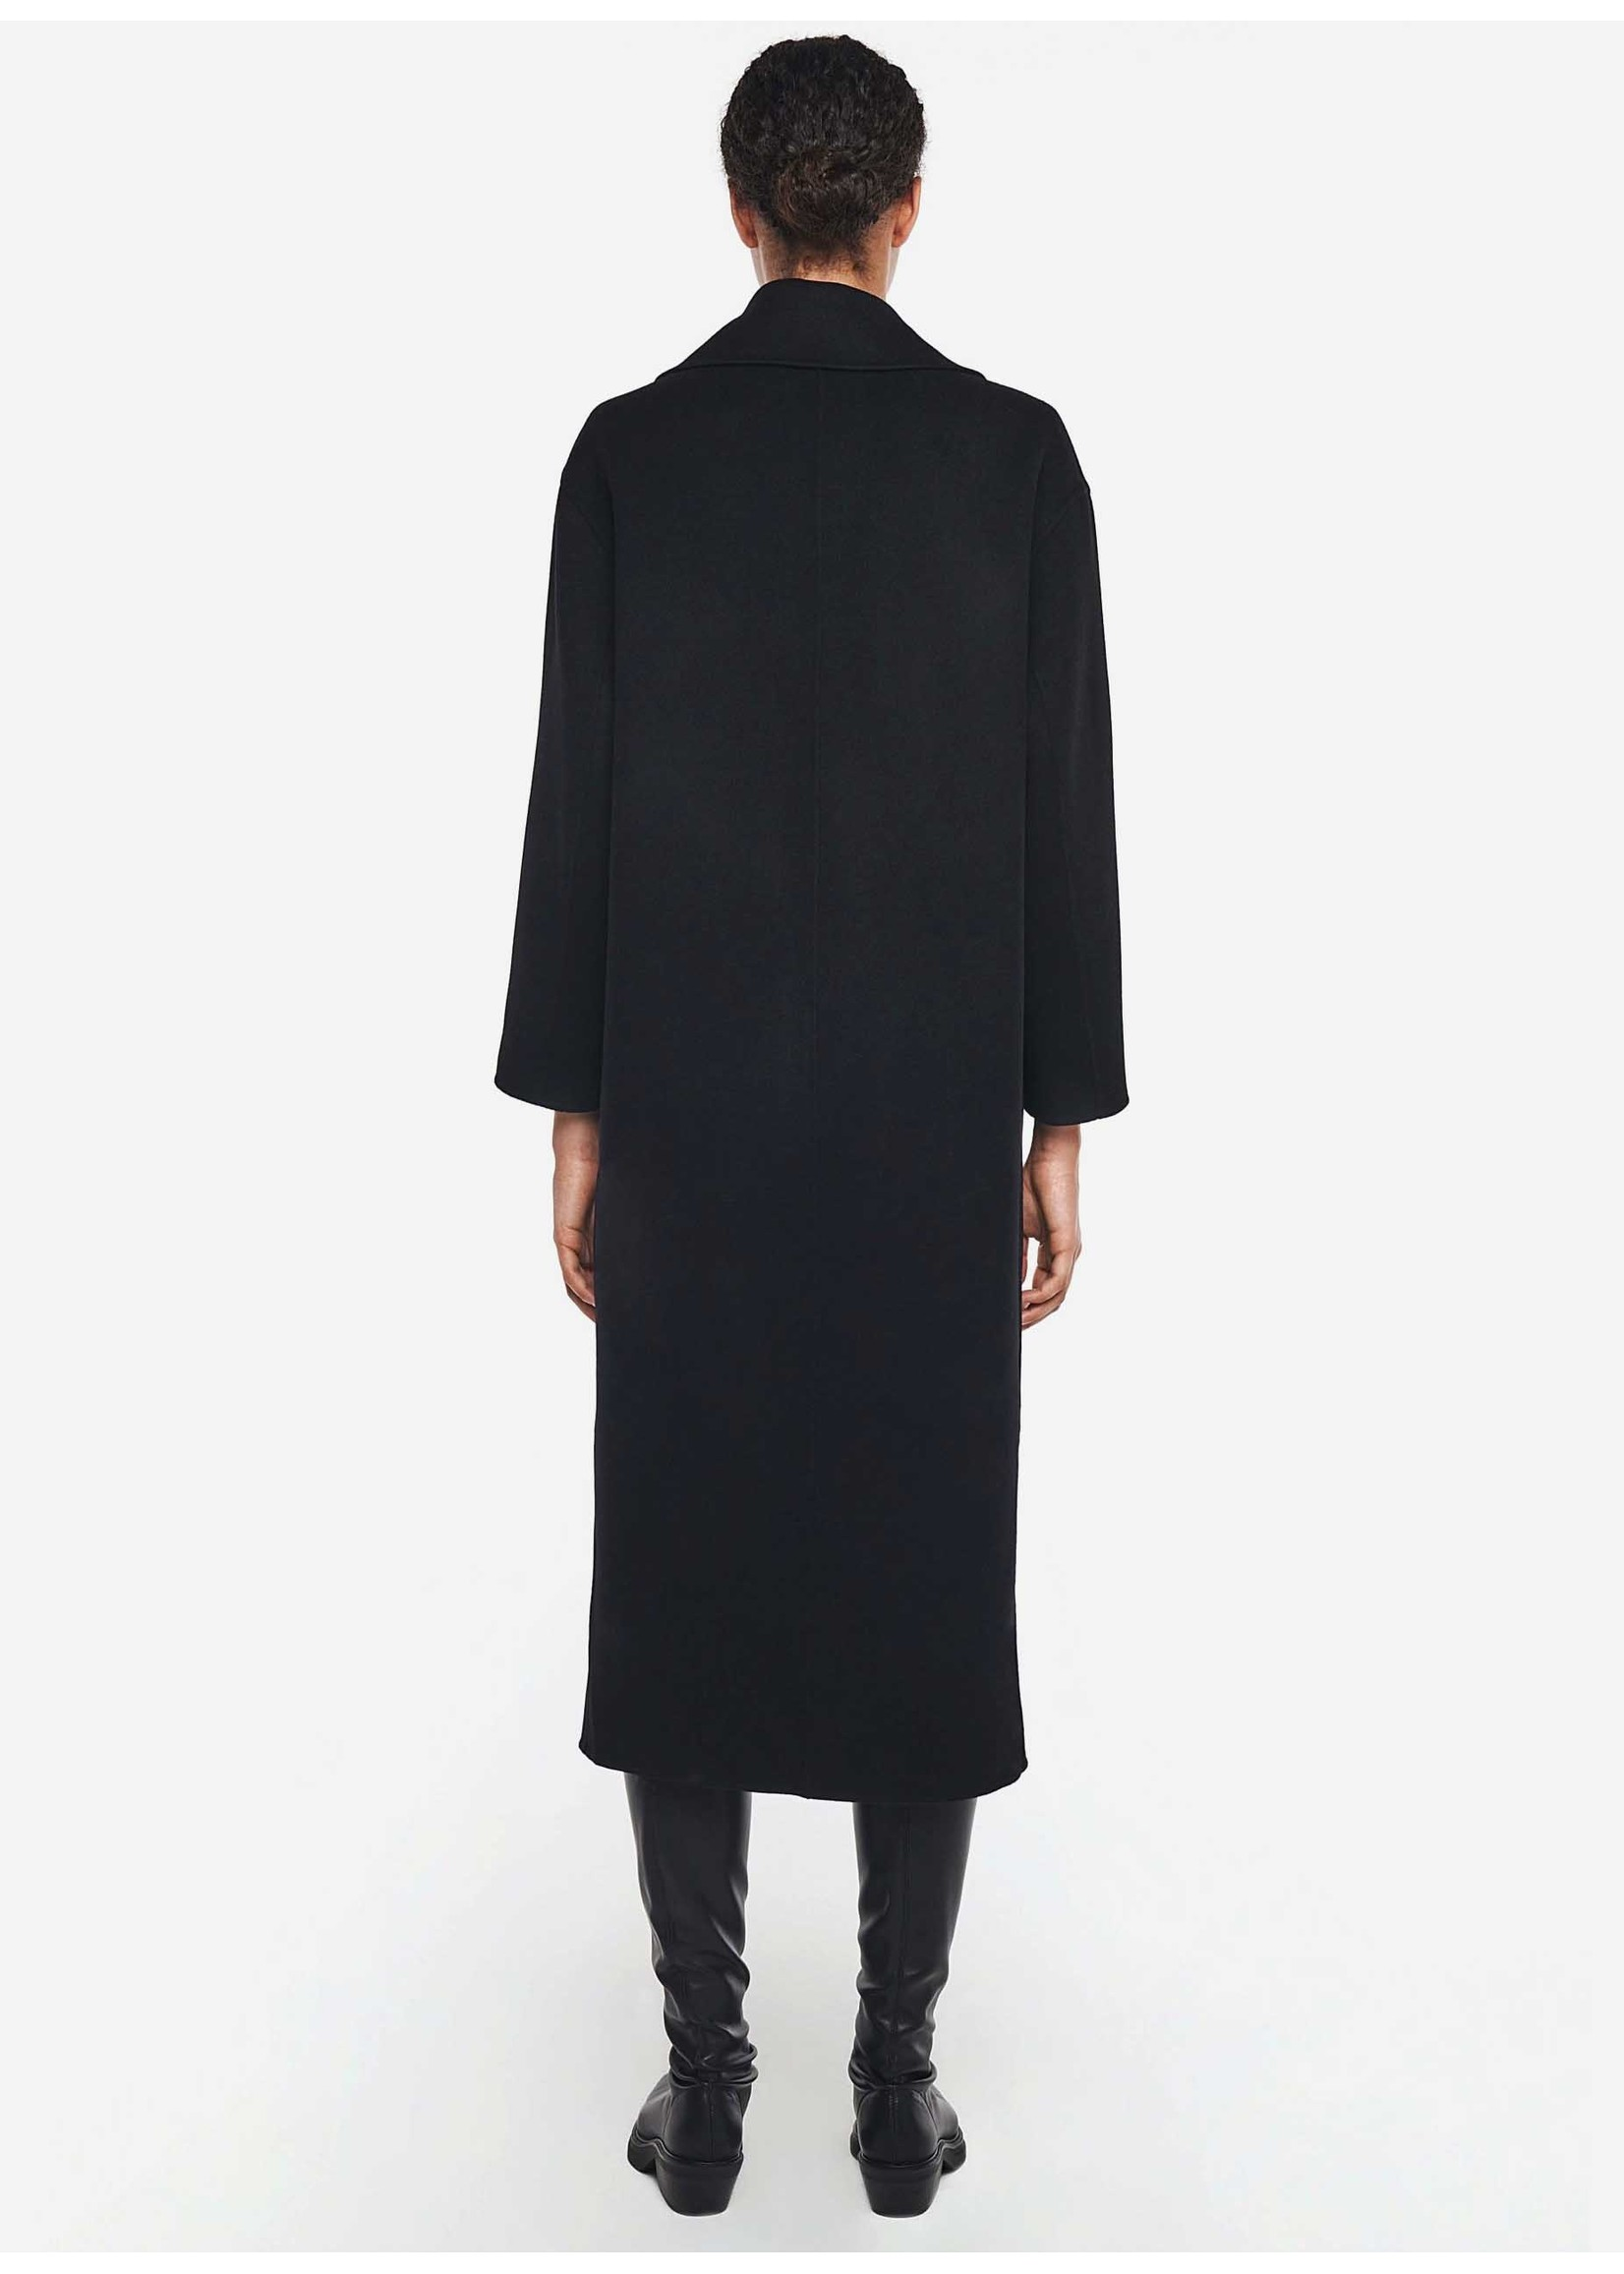 Arma Maral 100% Wool Black